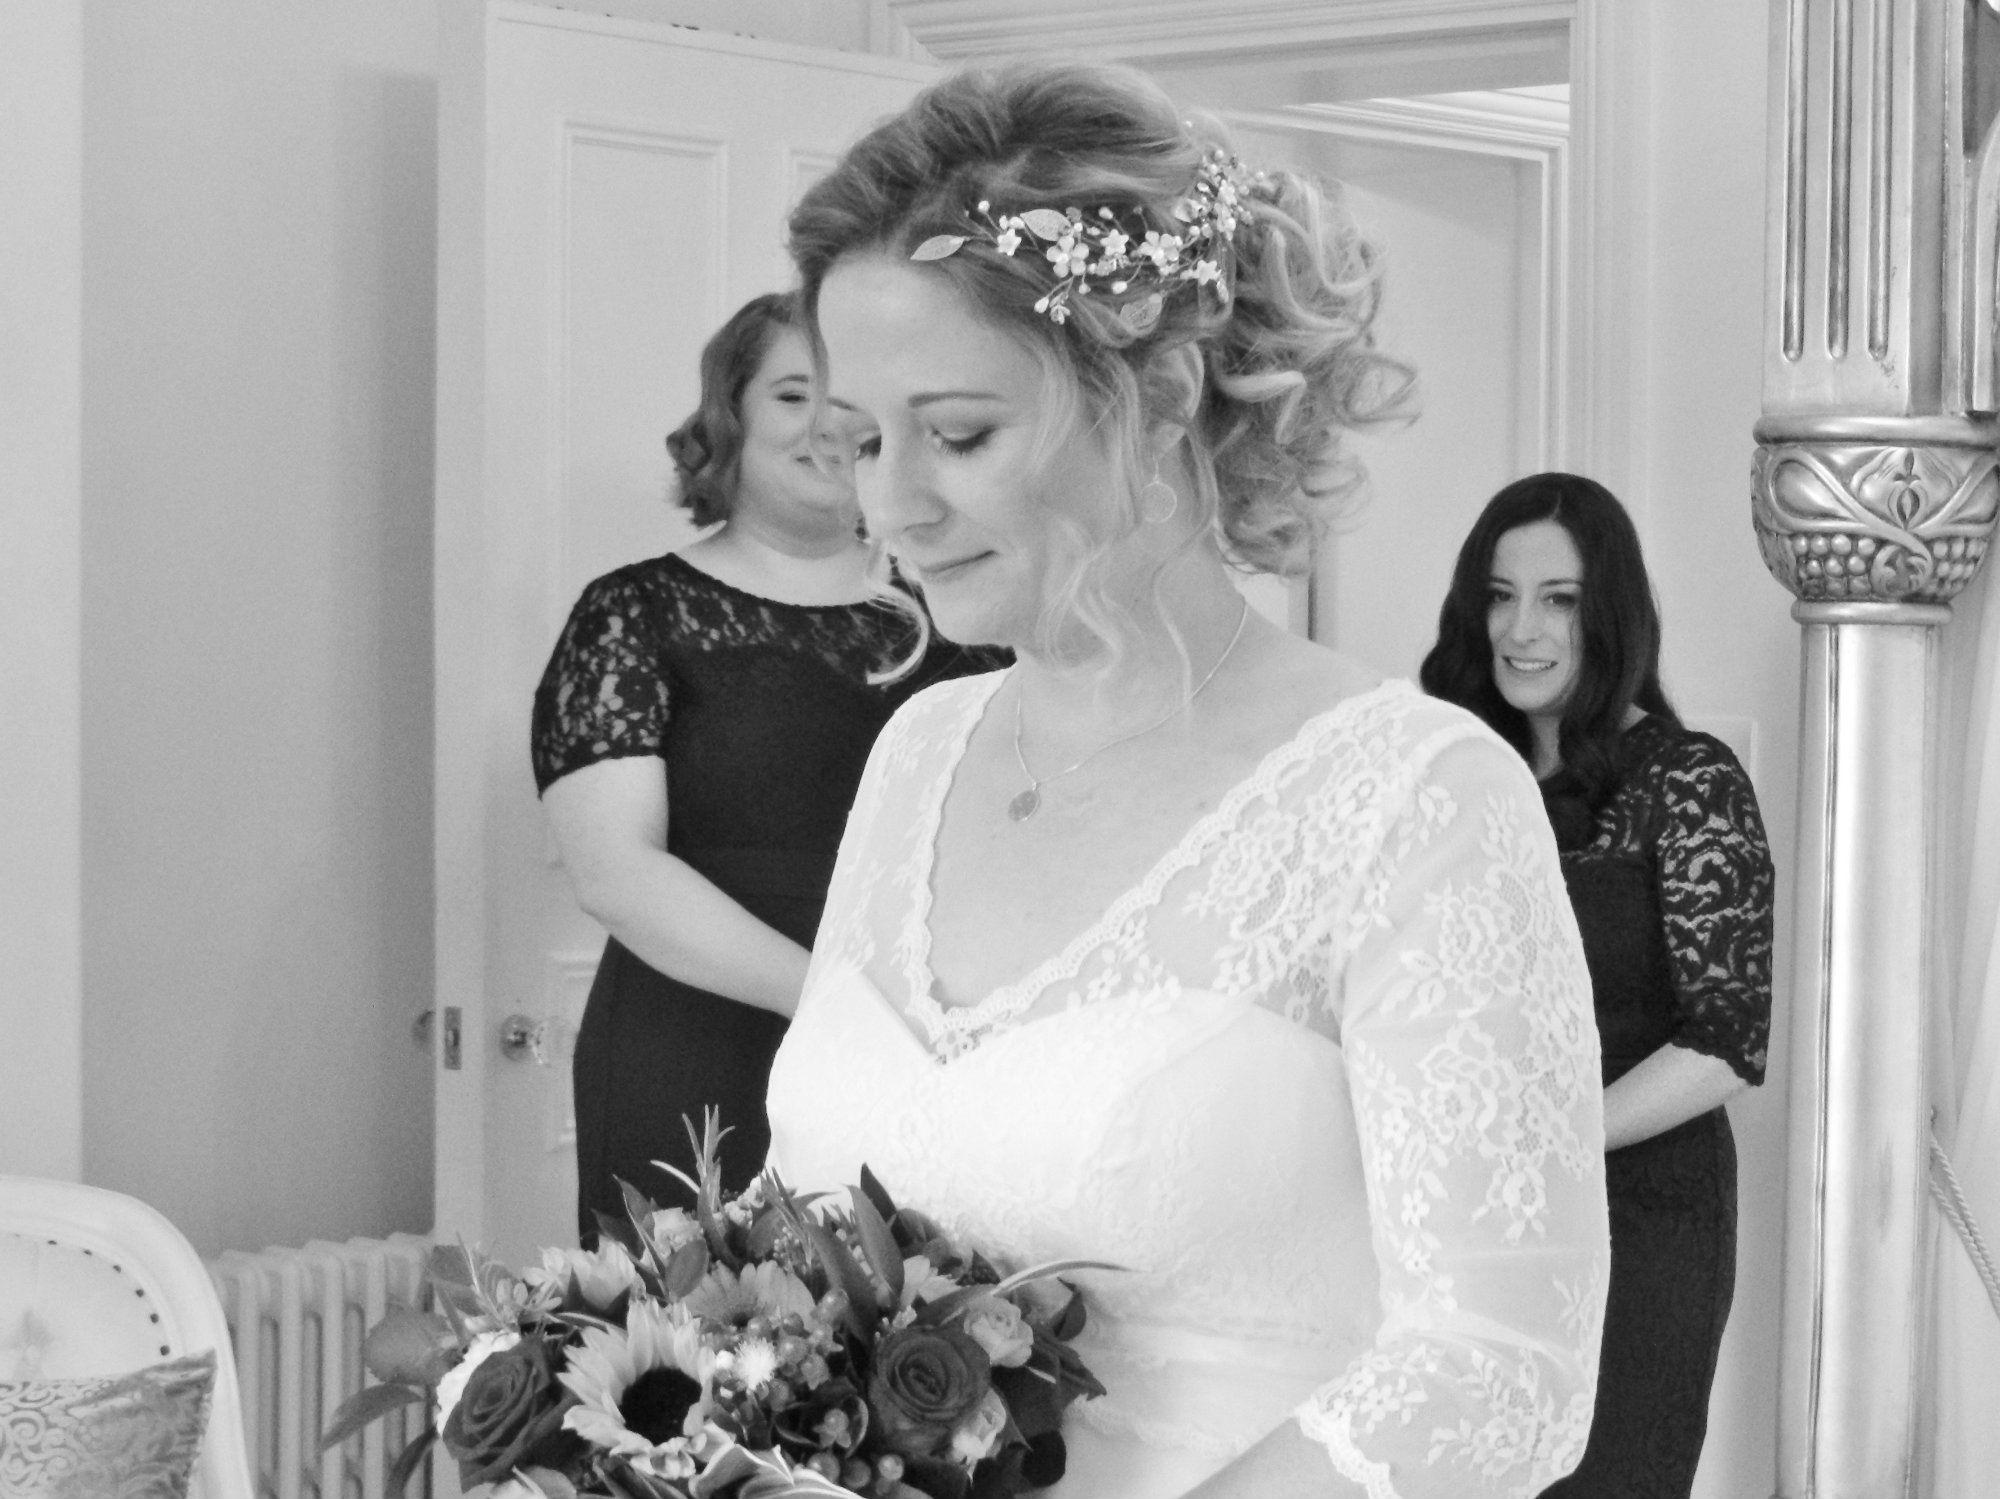 Bohemian-Bridal hair accessory-head piece-DSCN0653